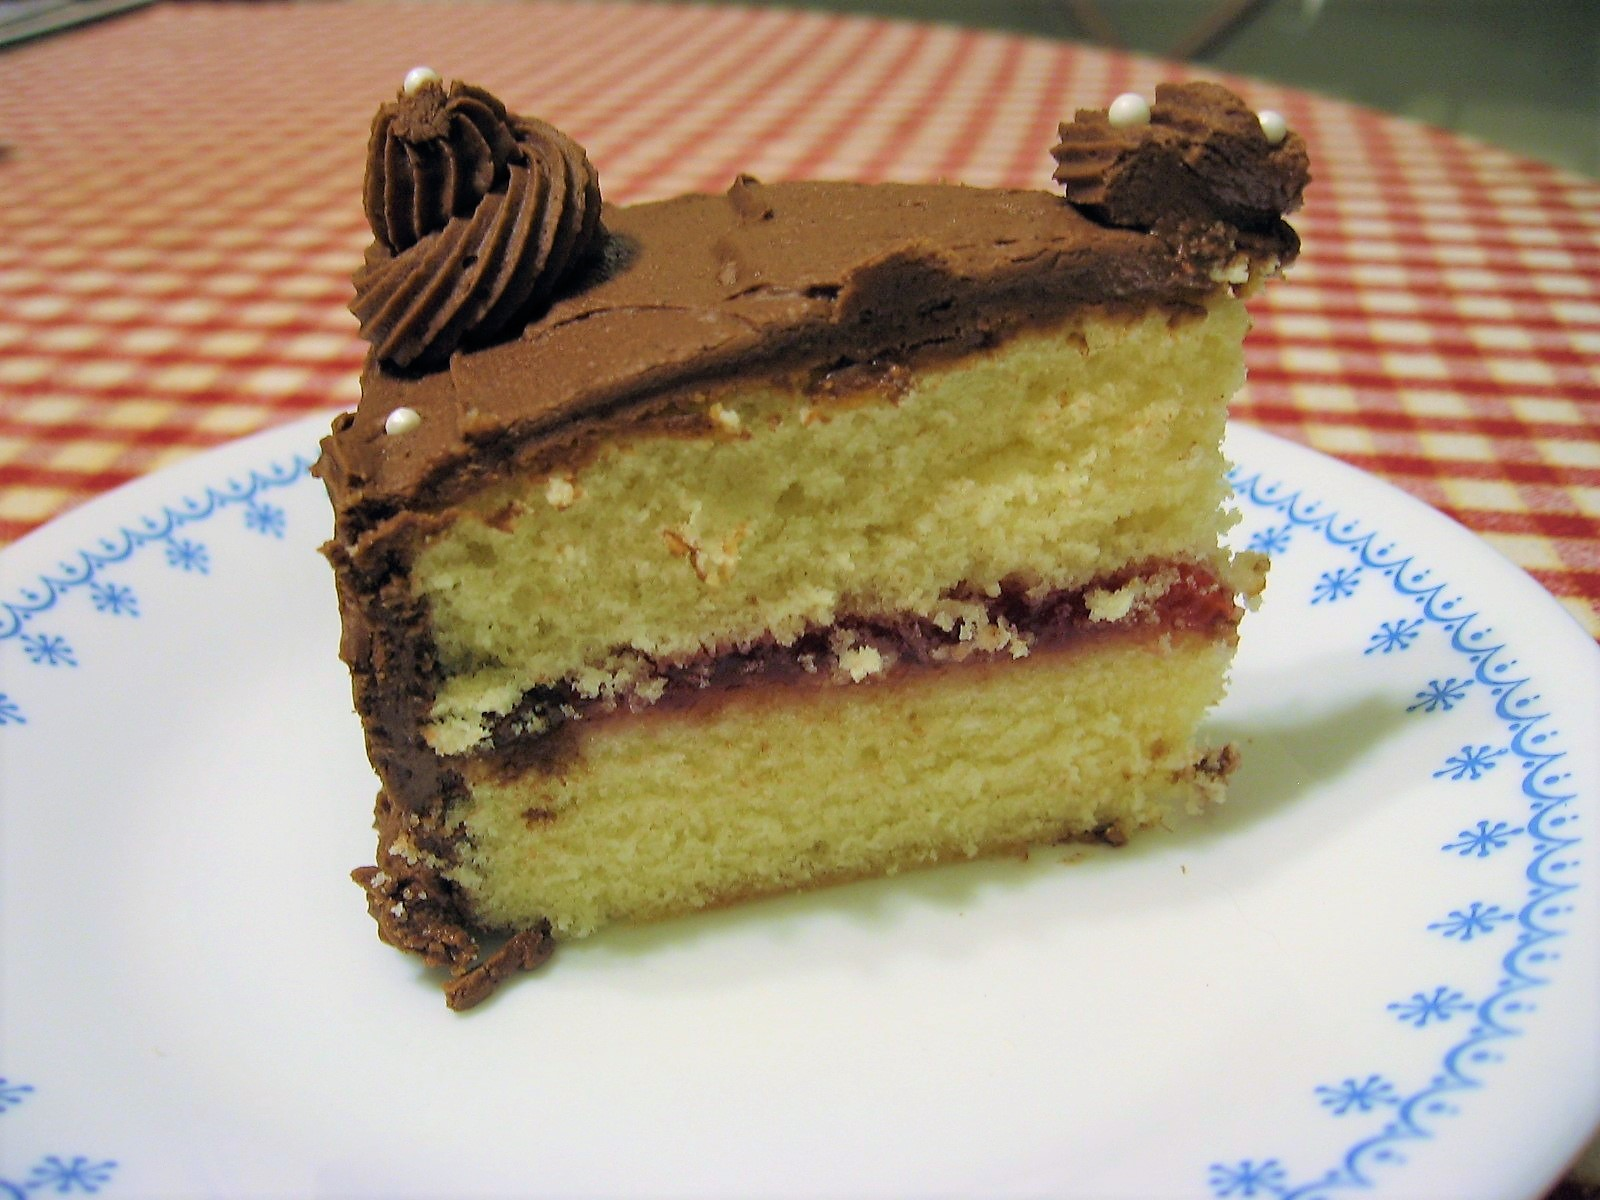 Mary Oppenhiemer's Butter Cake